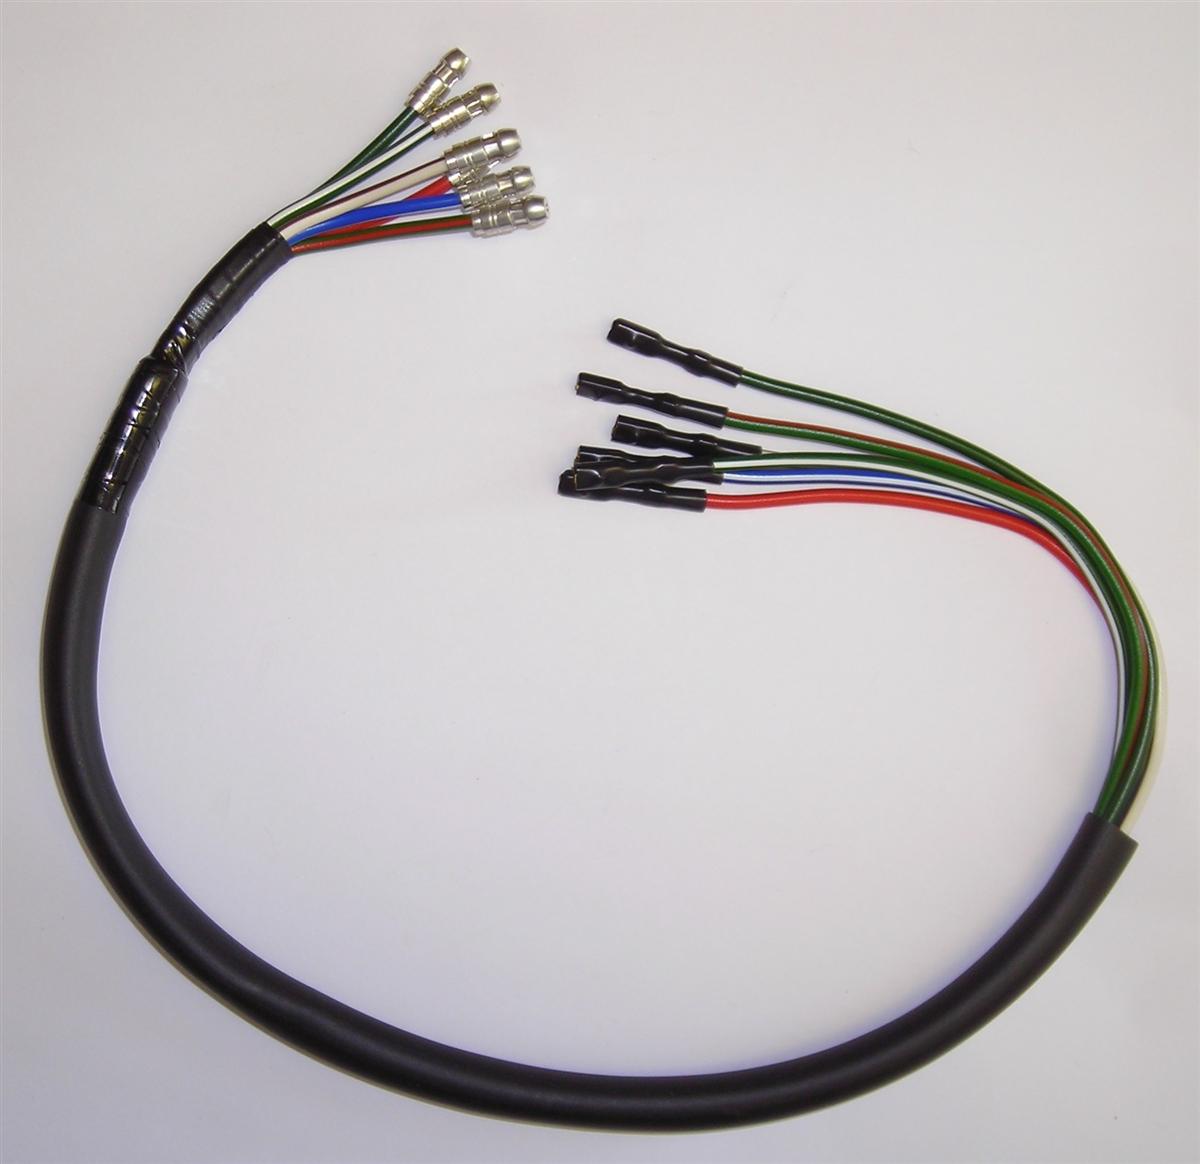 medium resolution of norton commando mk wiring diagram norton image norton commando wiring harness norton image wiring on norton